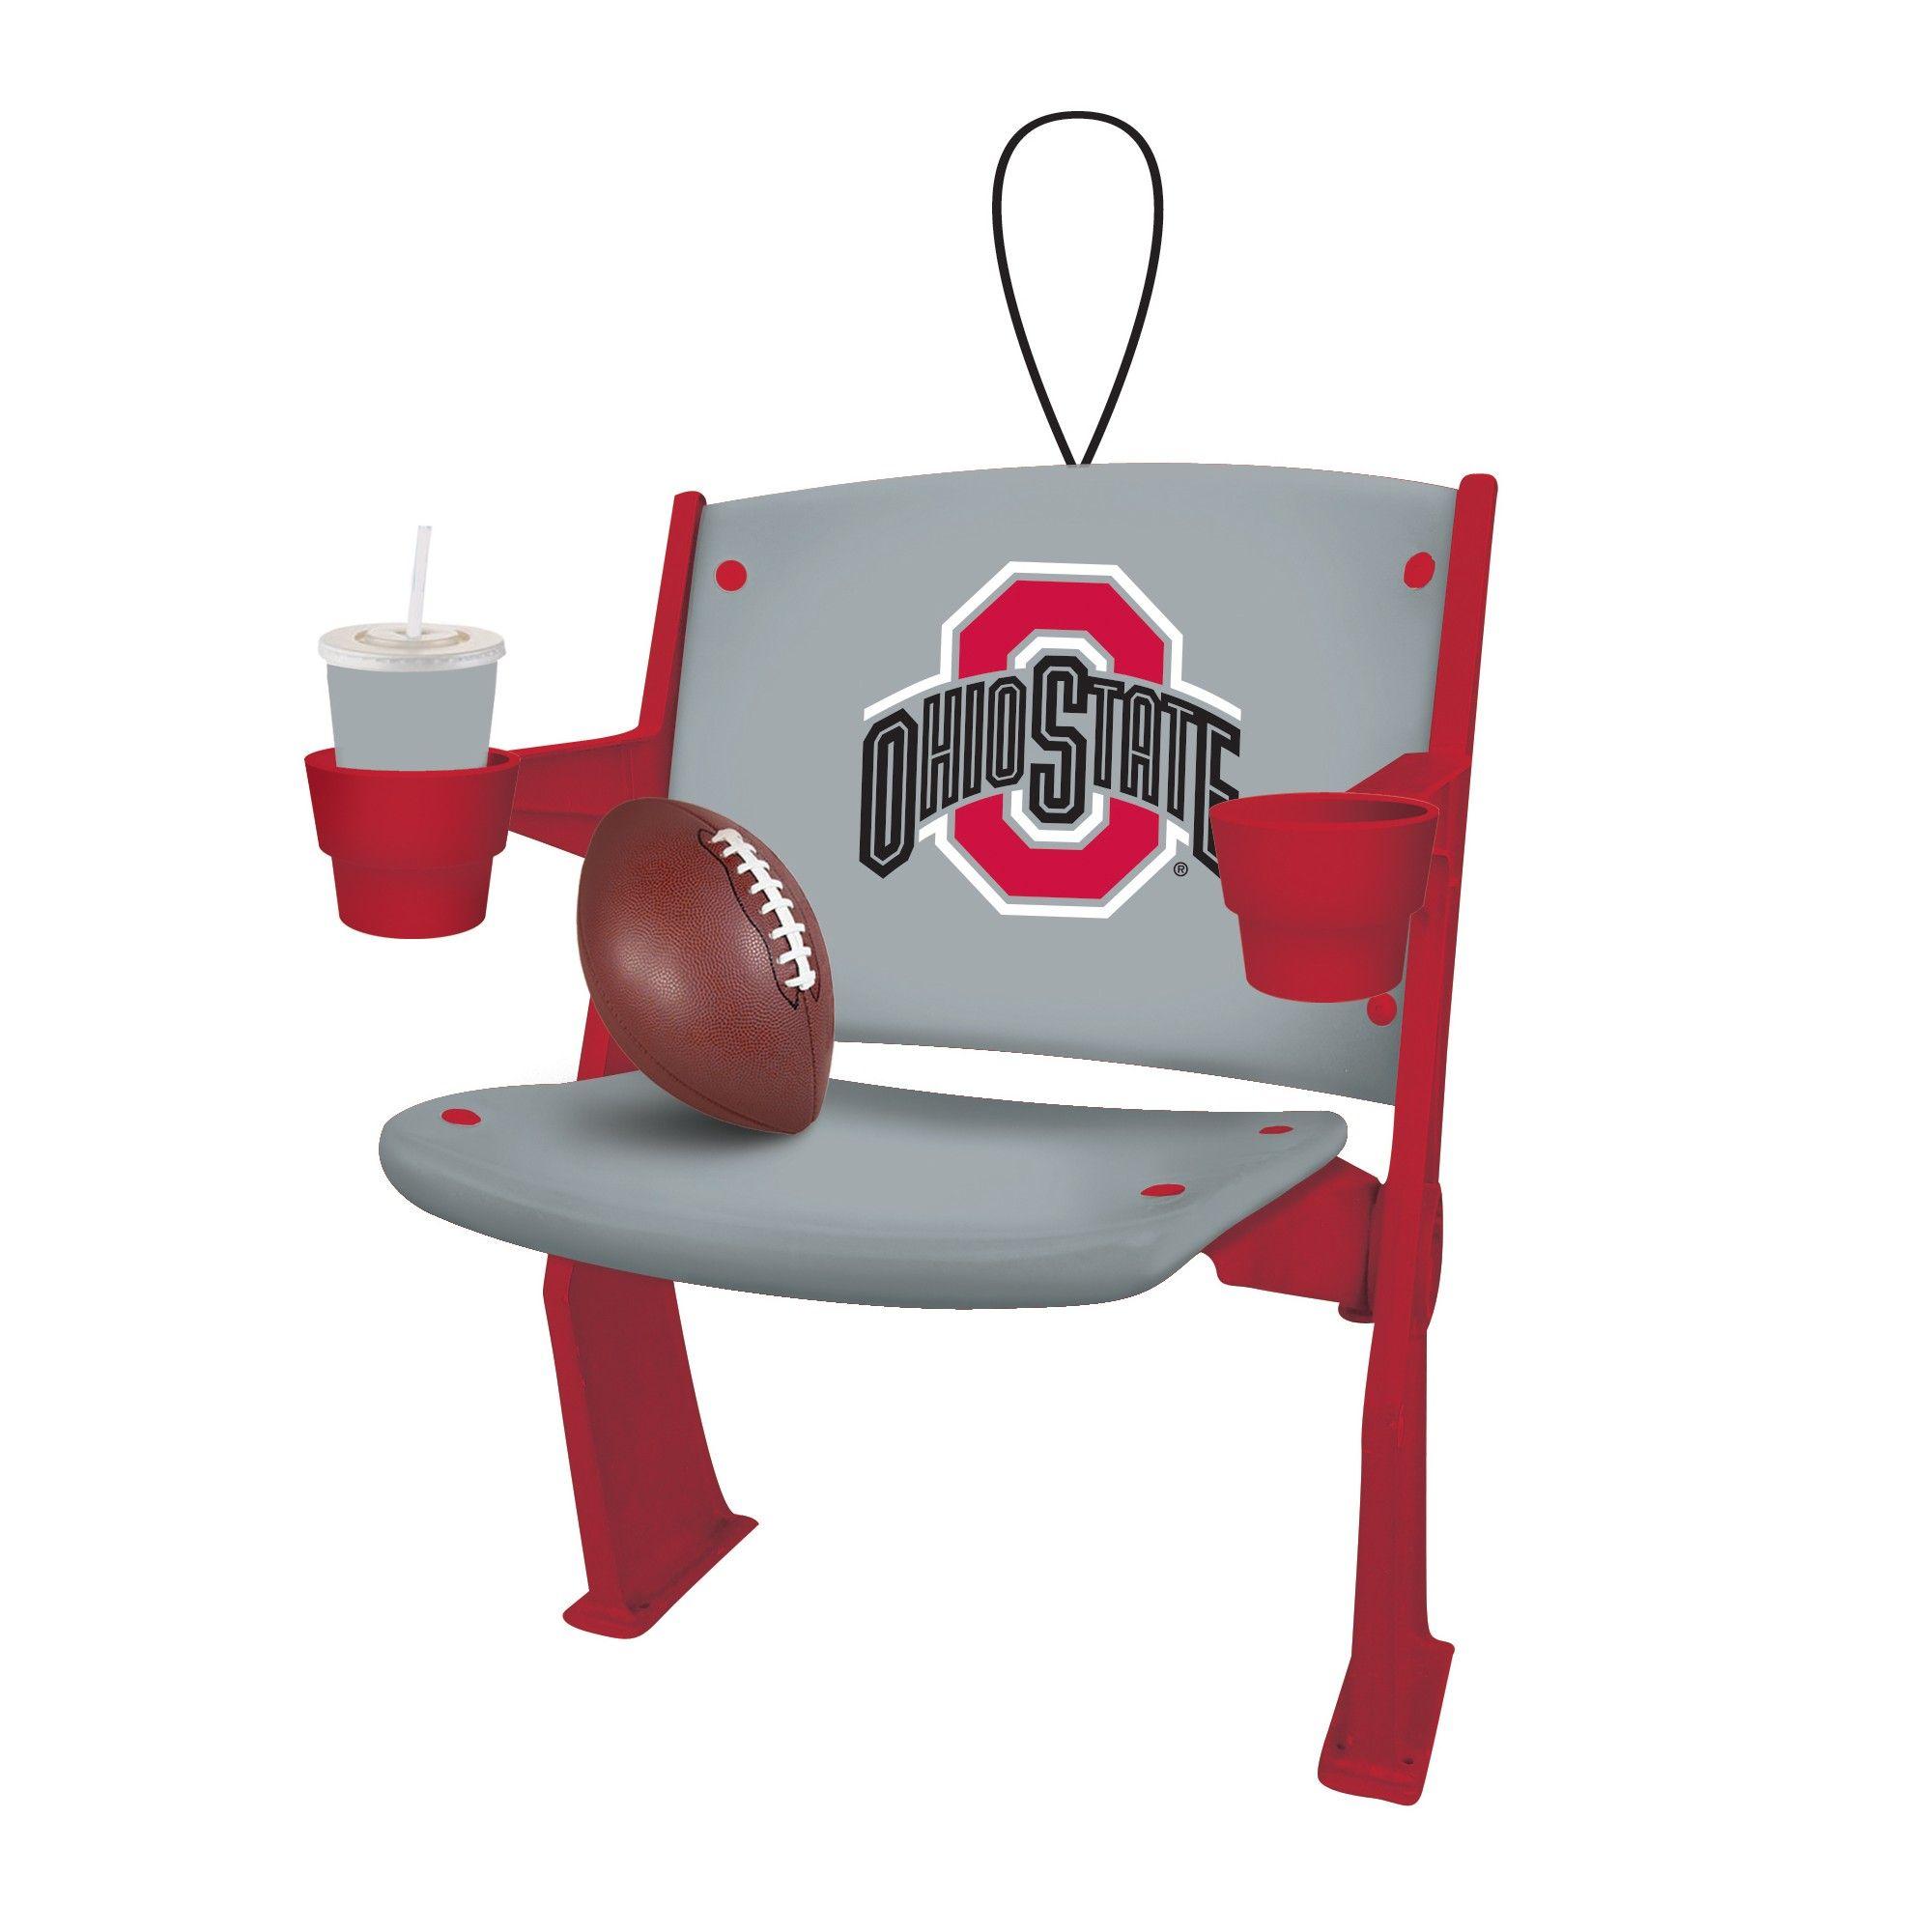 Ncaa Ohio State Buckeyes Chair Ornament Ohio State Buckeyes Ohio State Stadium Ohio